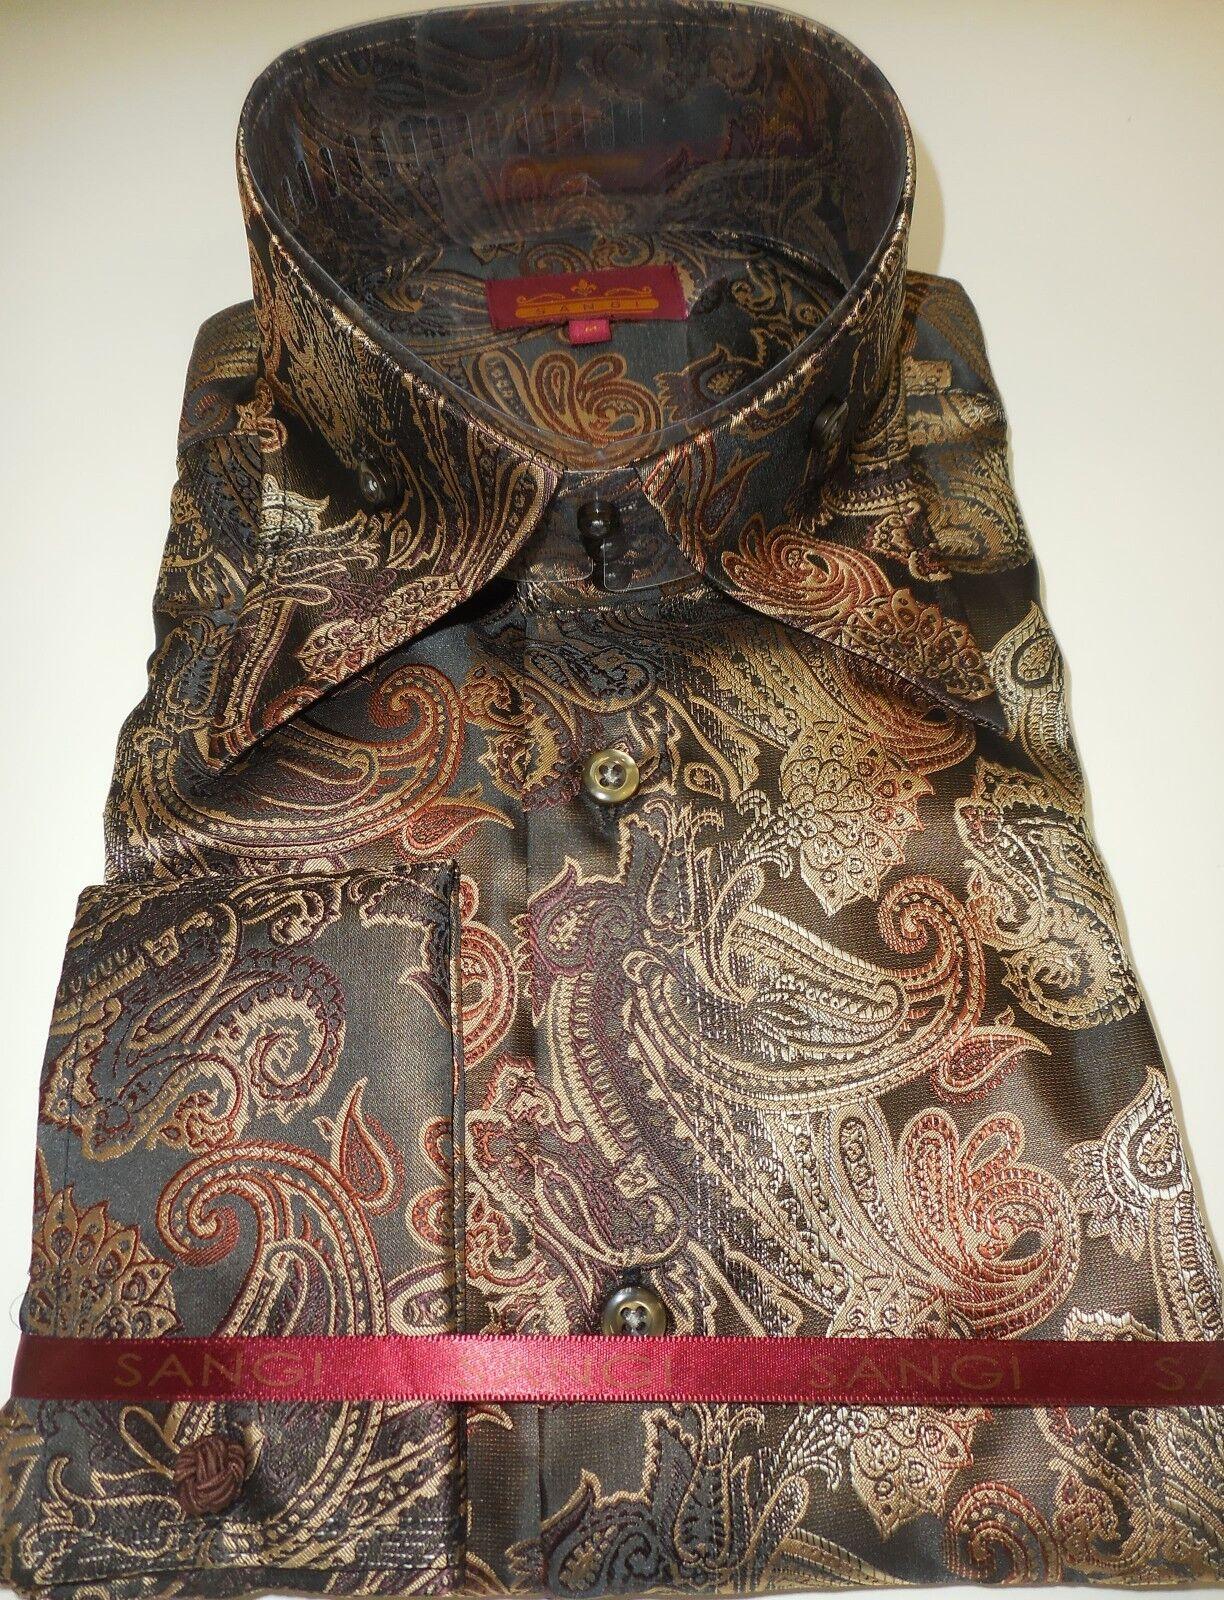 Mens Chocolate Paisley High Collar Jacquard Shirt SANGI ROME COLLECTION   2014